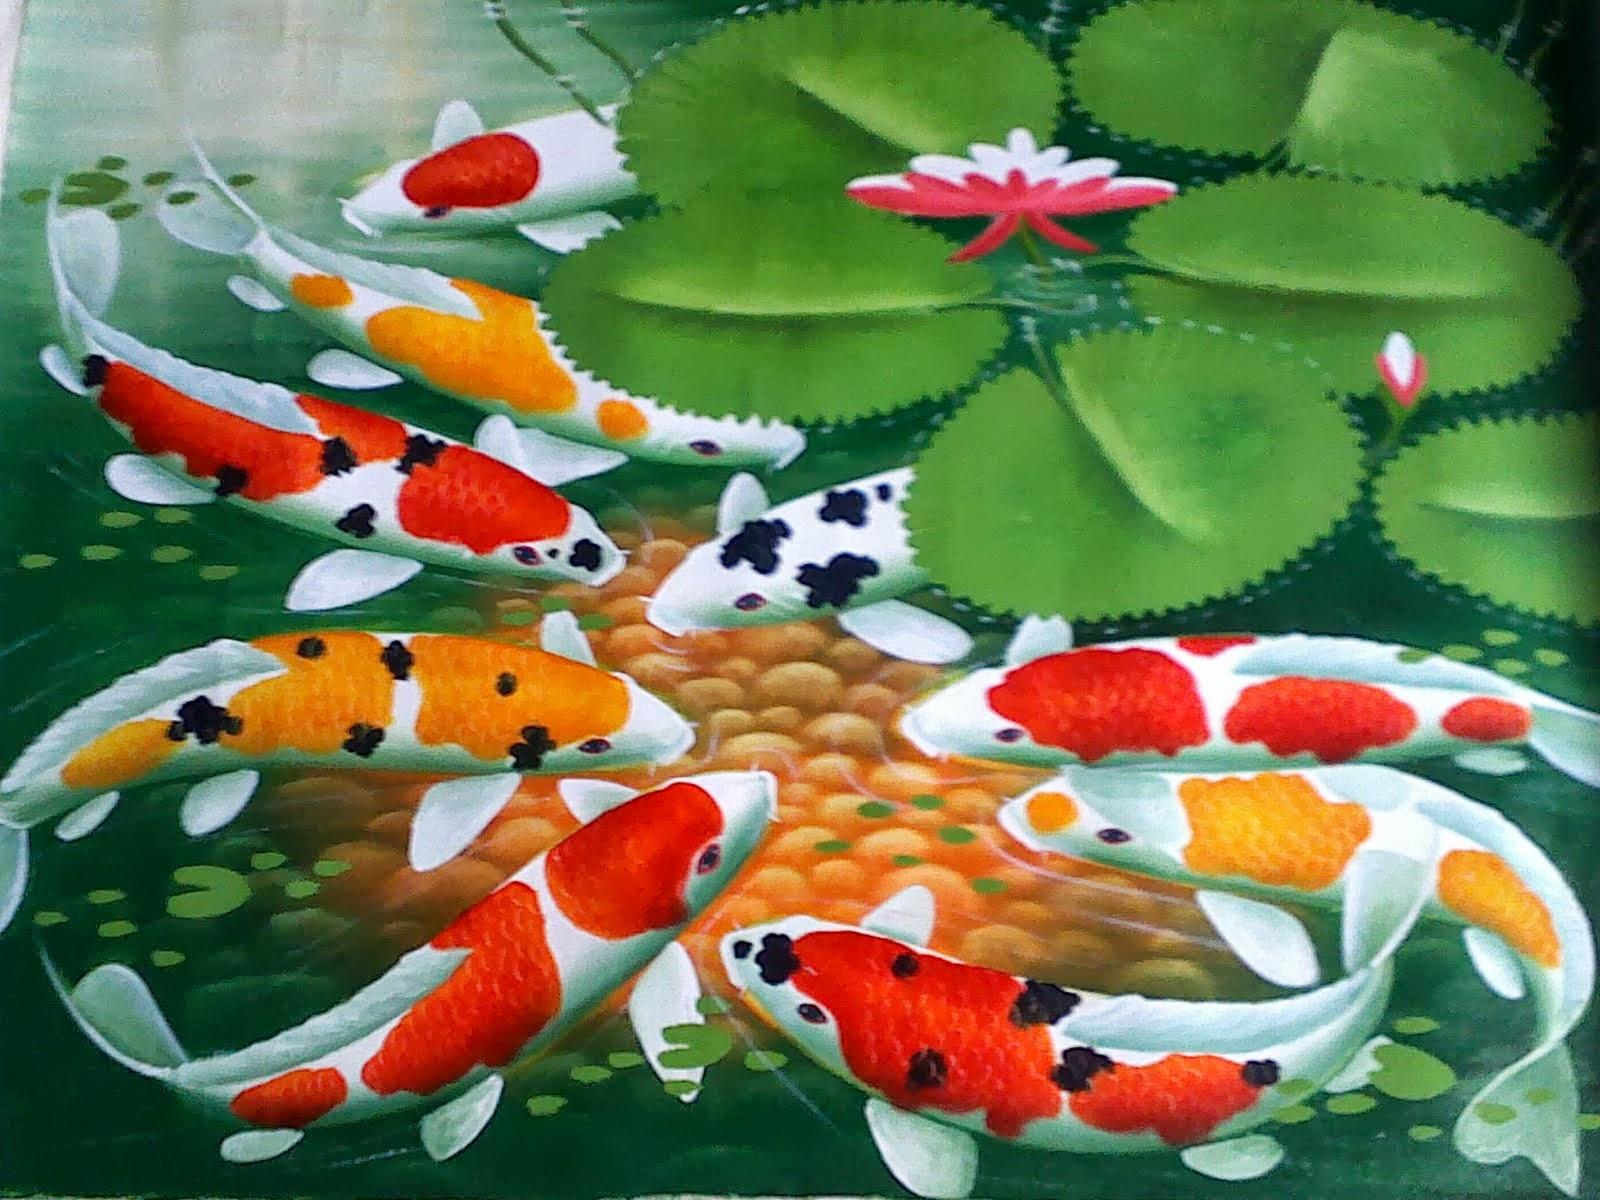 Gambar Ikan Koi - Animasi Korea Meme Lucu Emo Bergerak